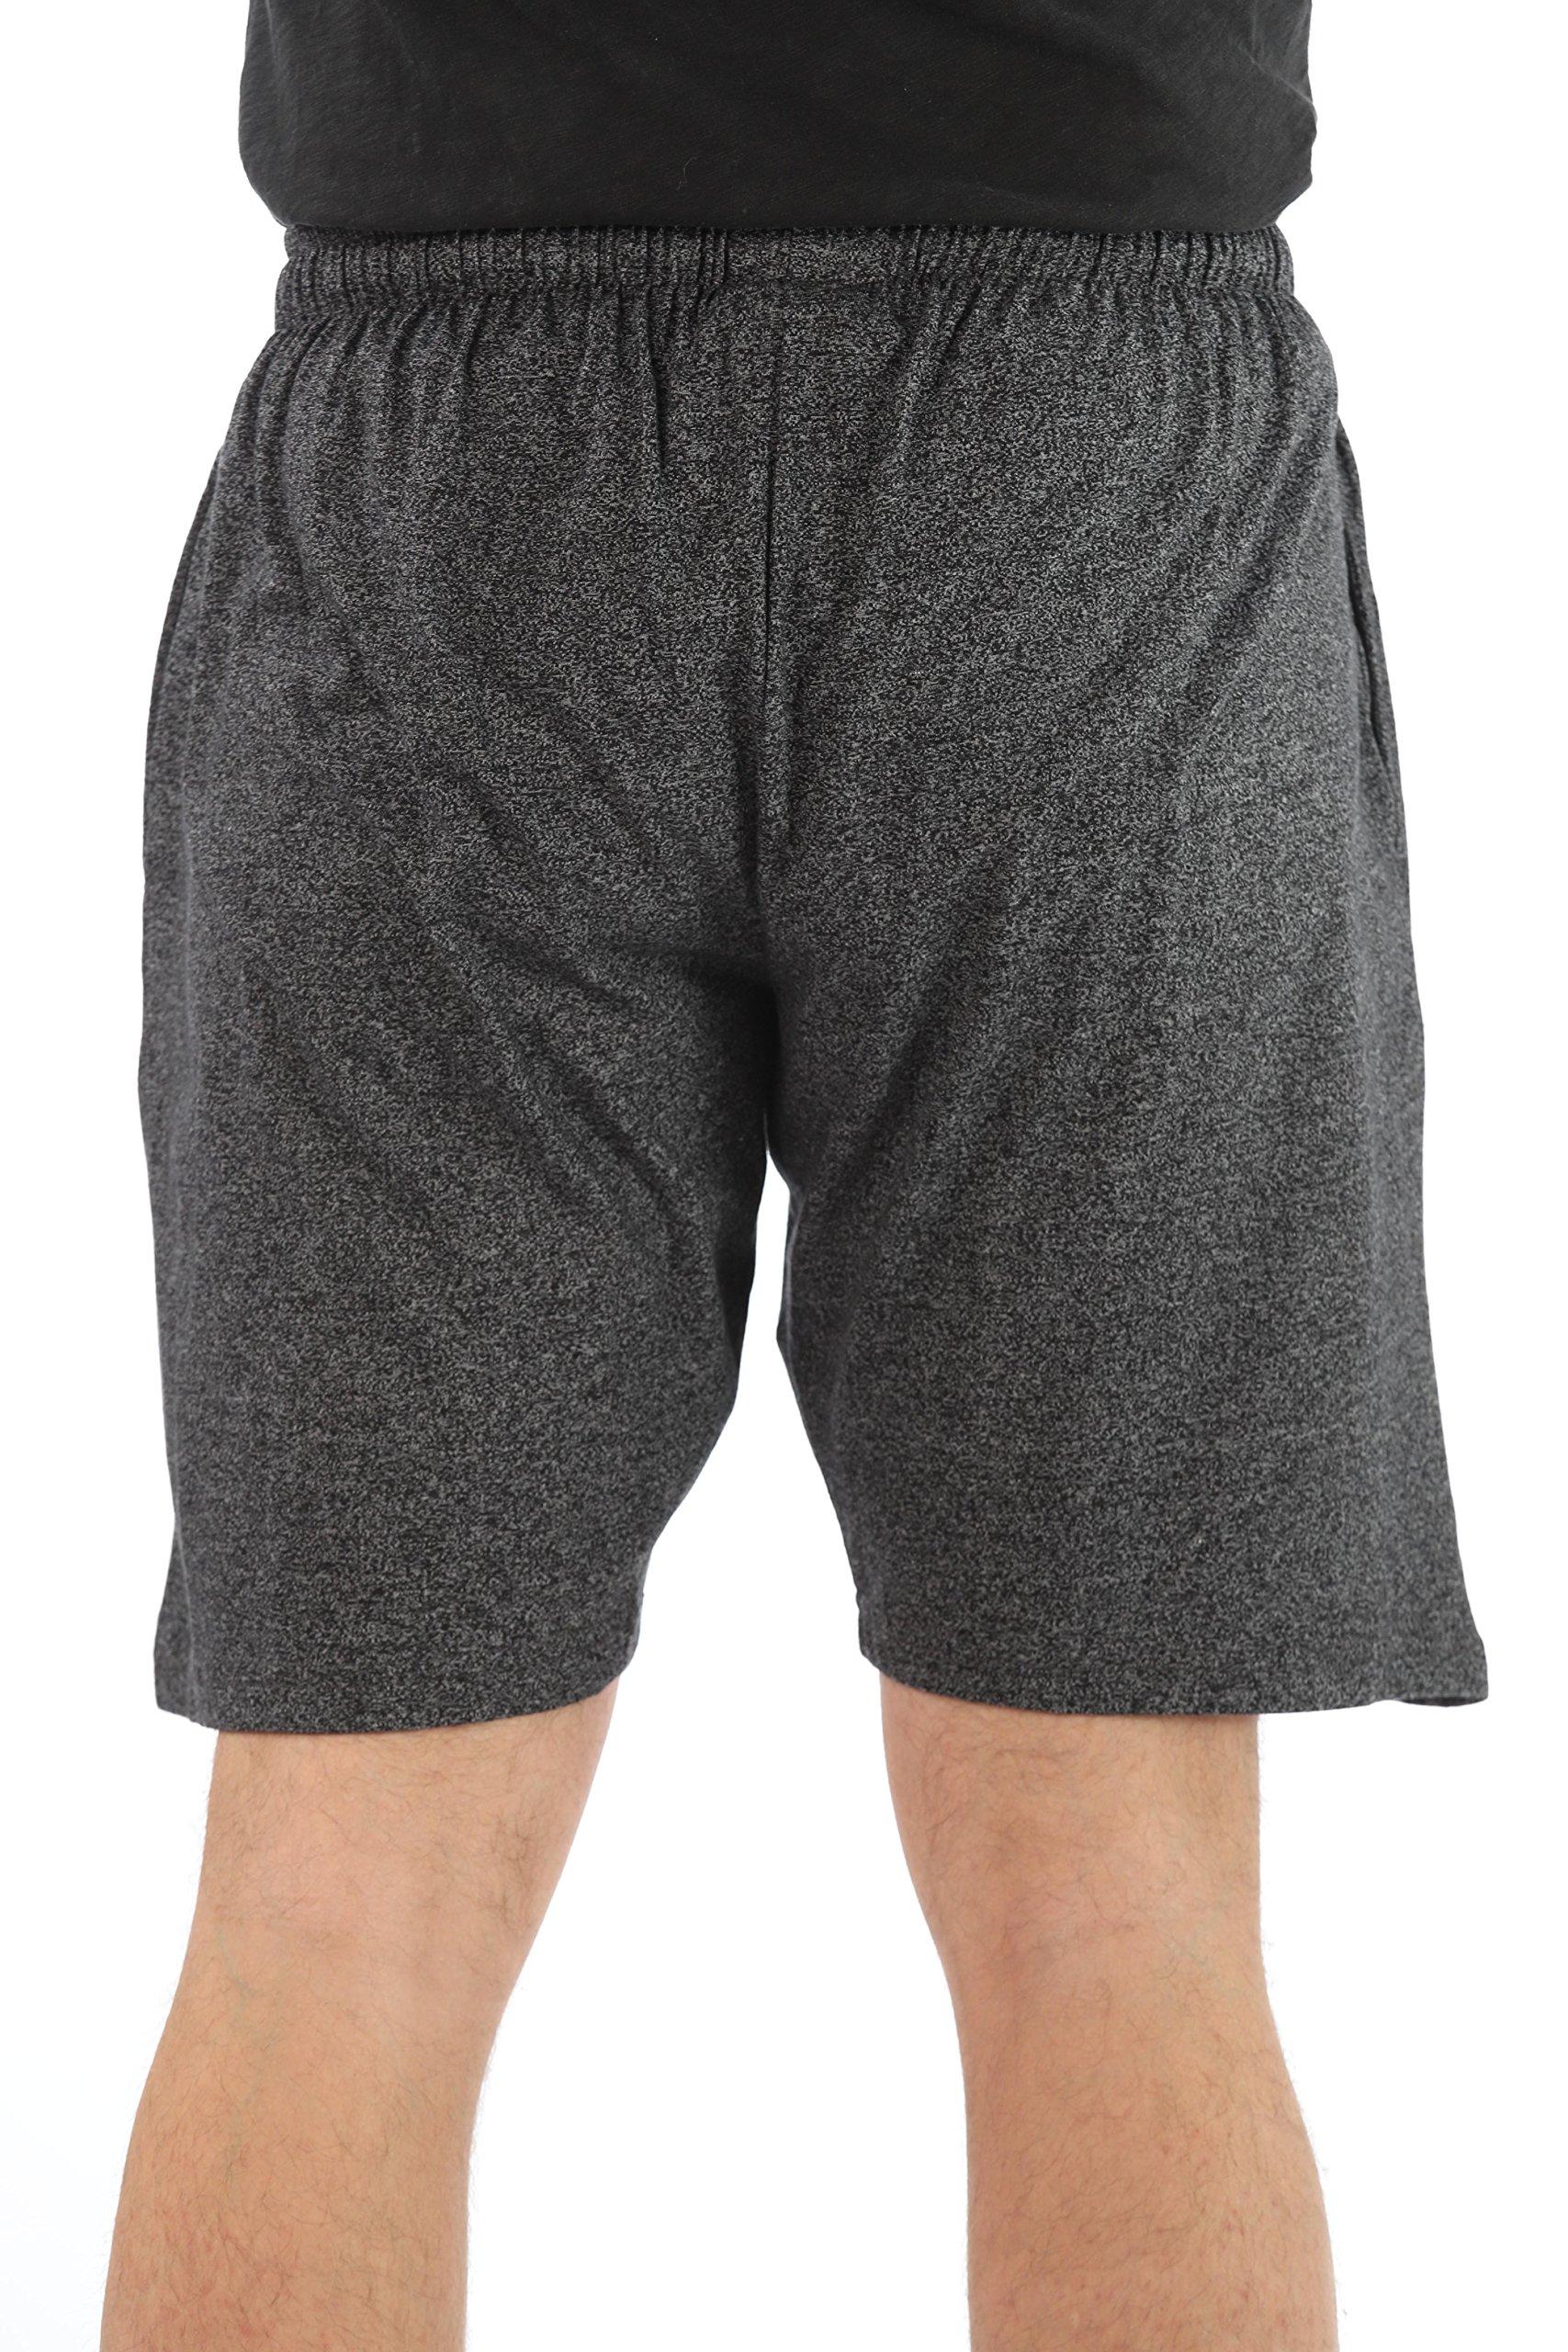 At The Buzzer Men's Pajama Shorts Sleepwear PJS 14504-BLK-L by At The Buzzer (Image #3)